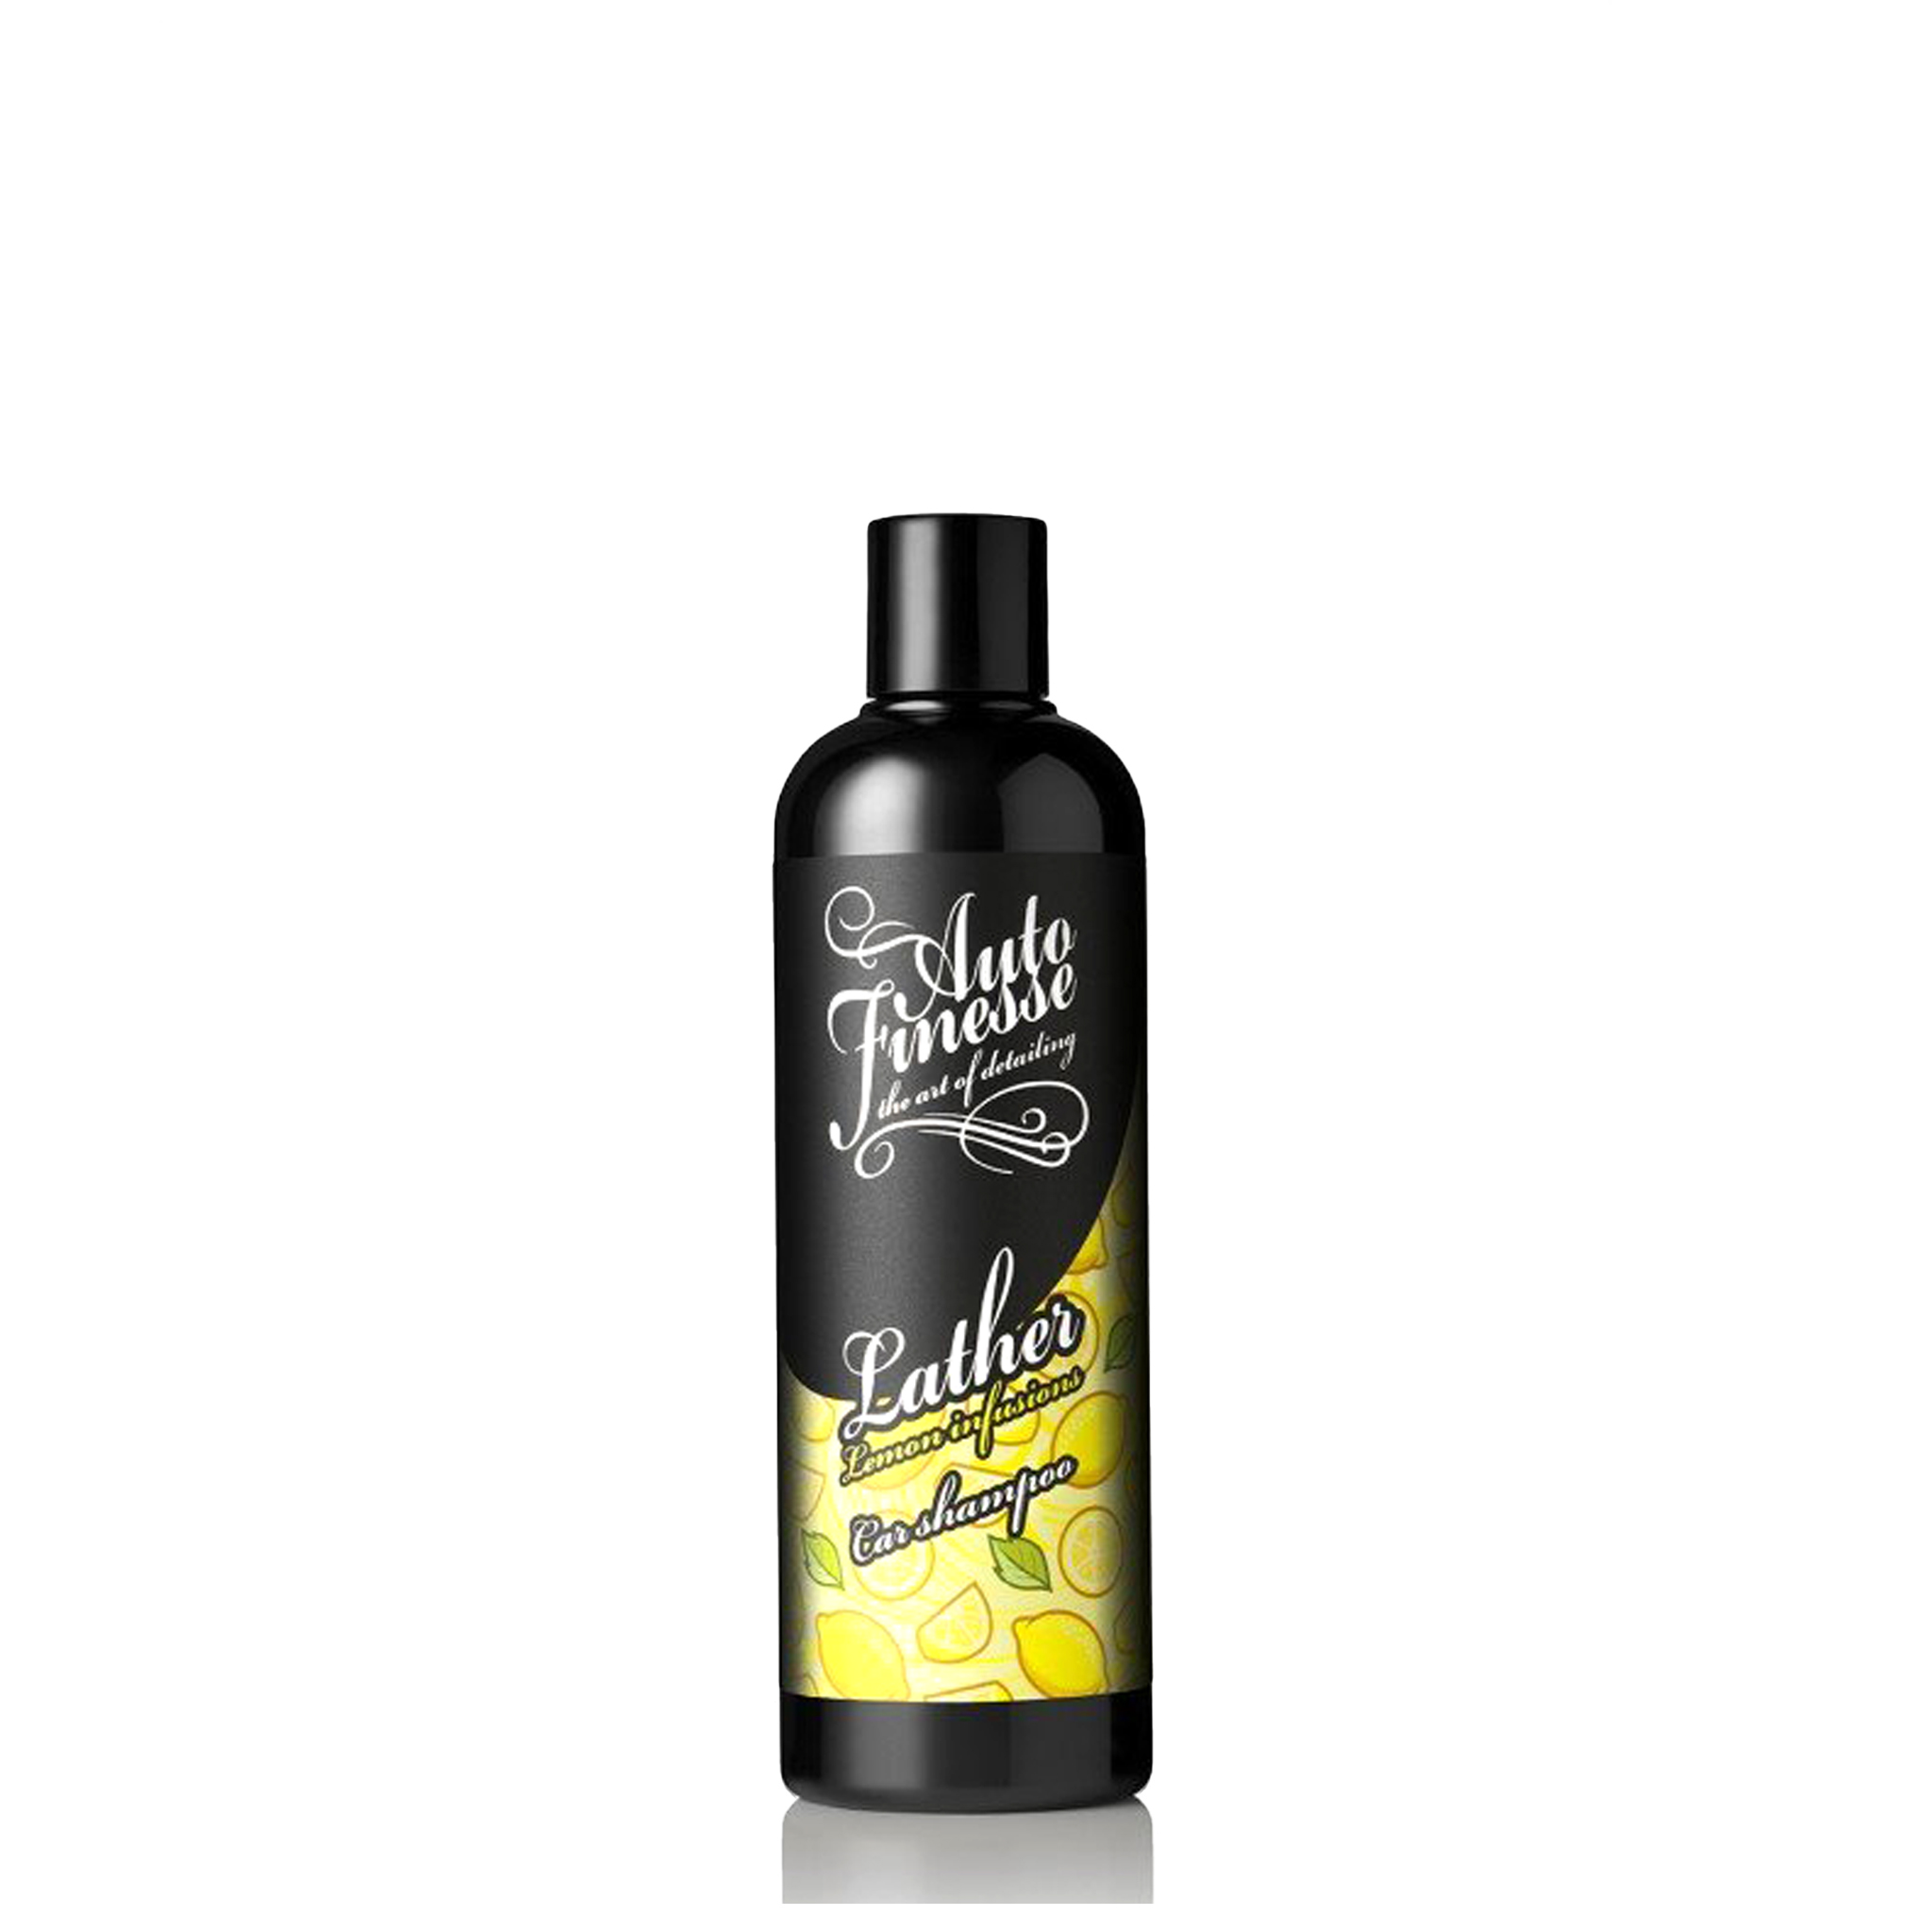 Bilschampo Auto Finesse Lather Lemon, 500 ml